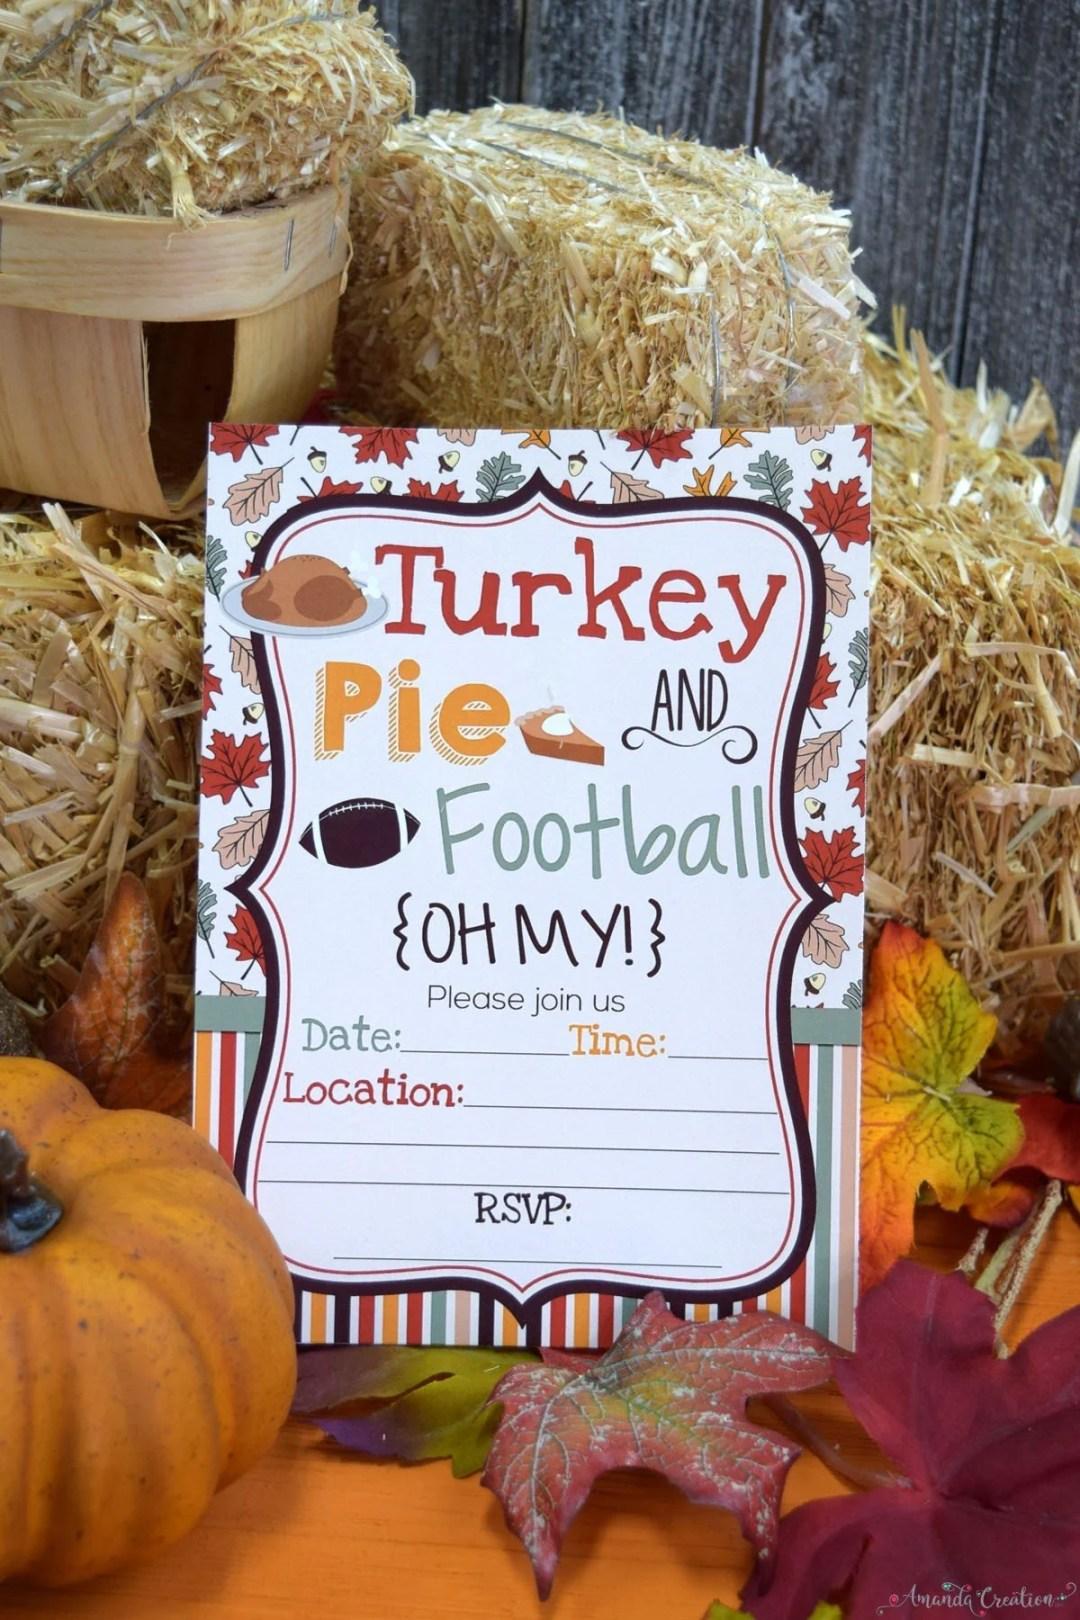 Turkey pie and football oh my invitation